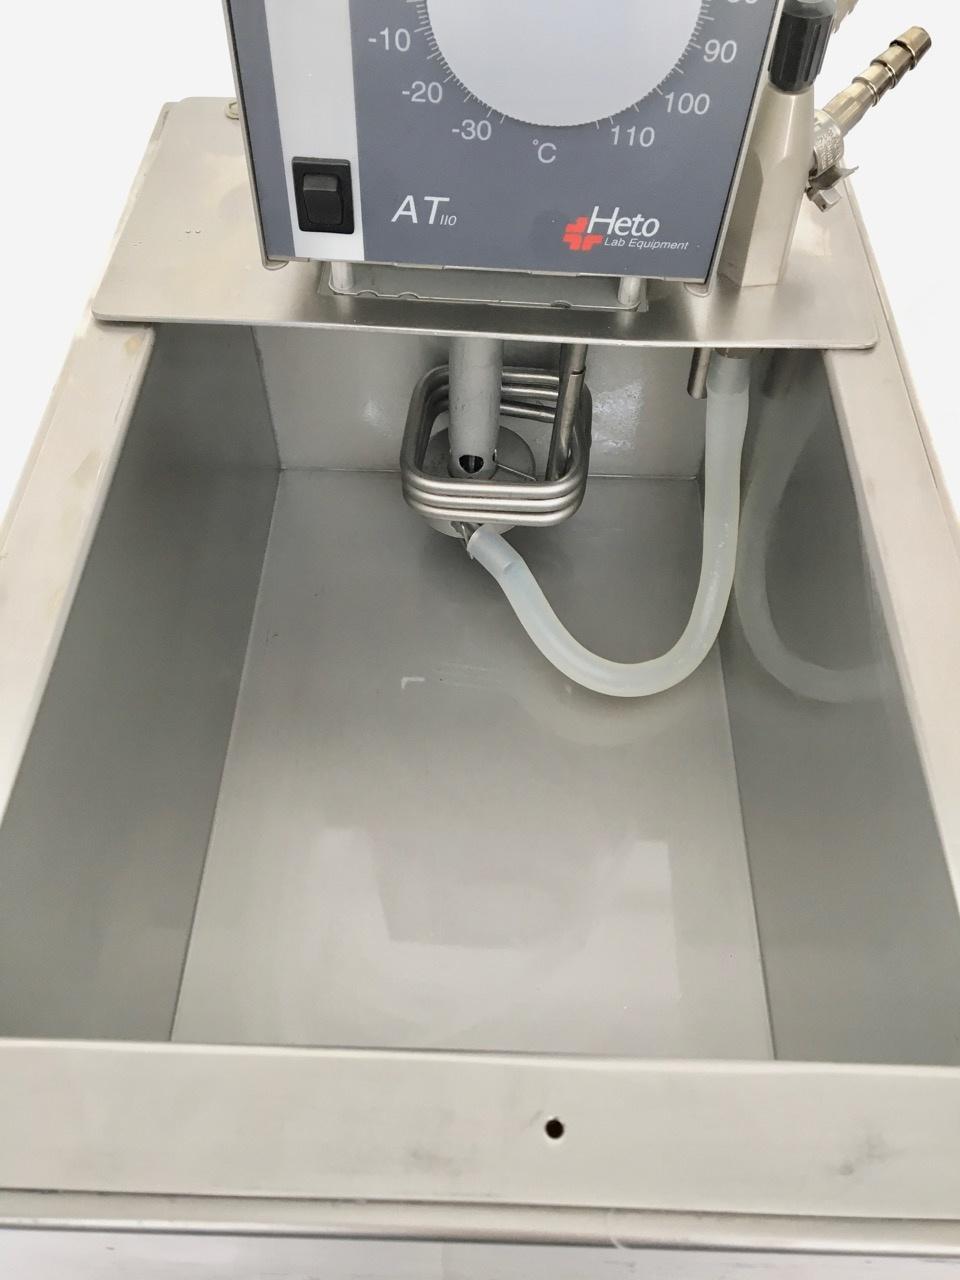 HETO Heto AT 23 Kryostat. -30°C bis + 110°C.